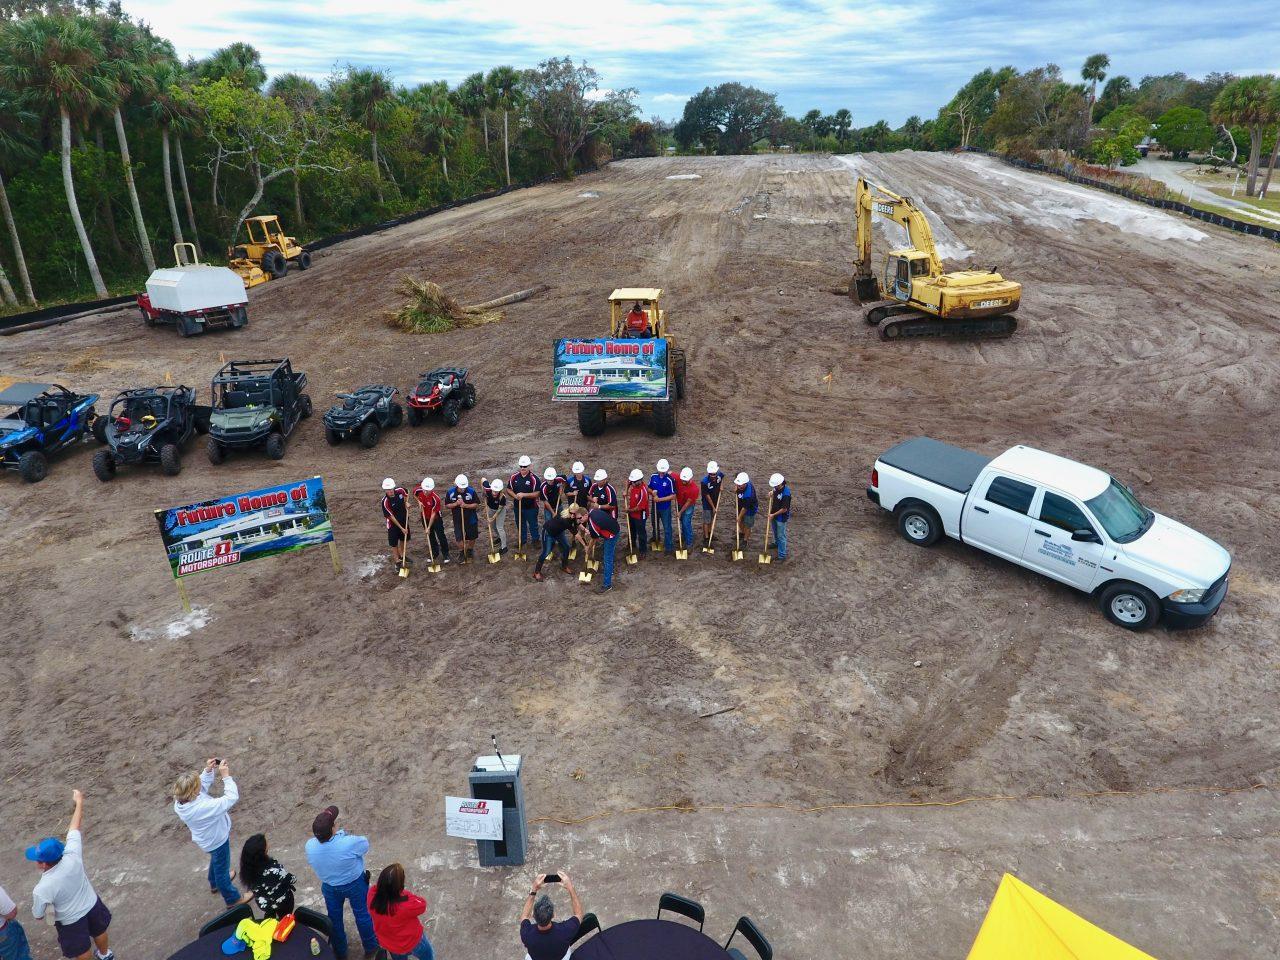 Press Event Coverage: Route 1 Motorsports Groundbreaking Ceremony